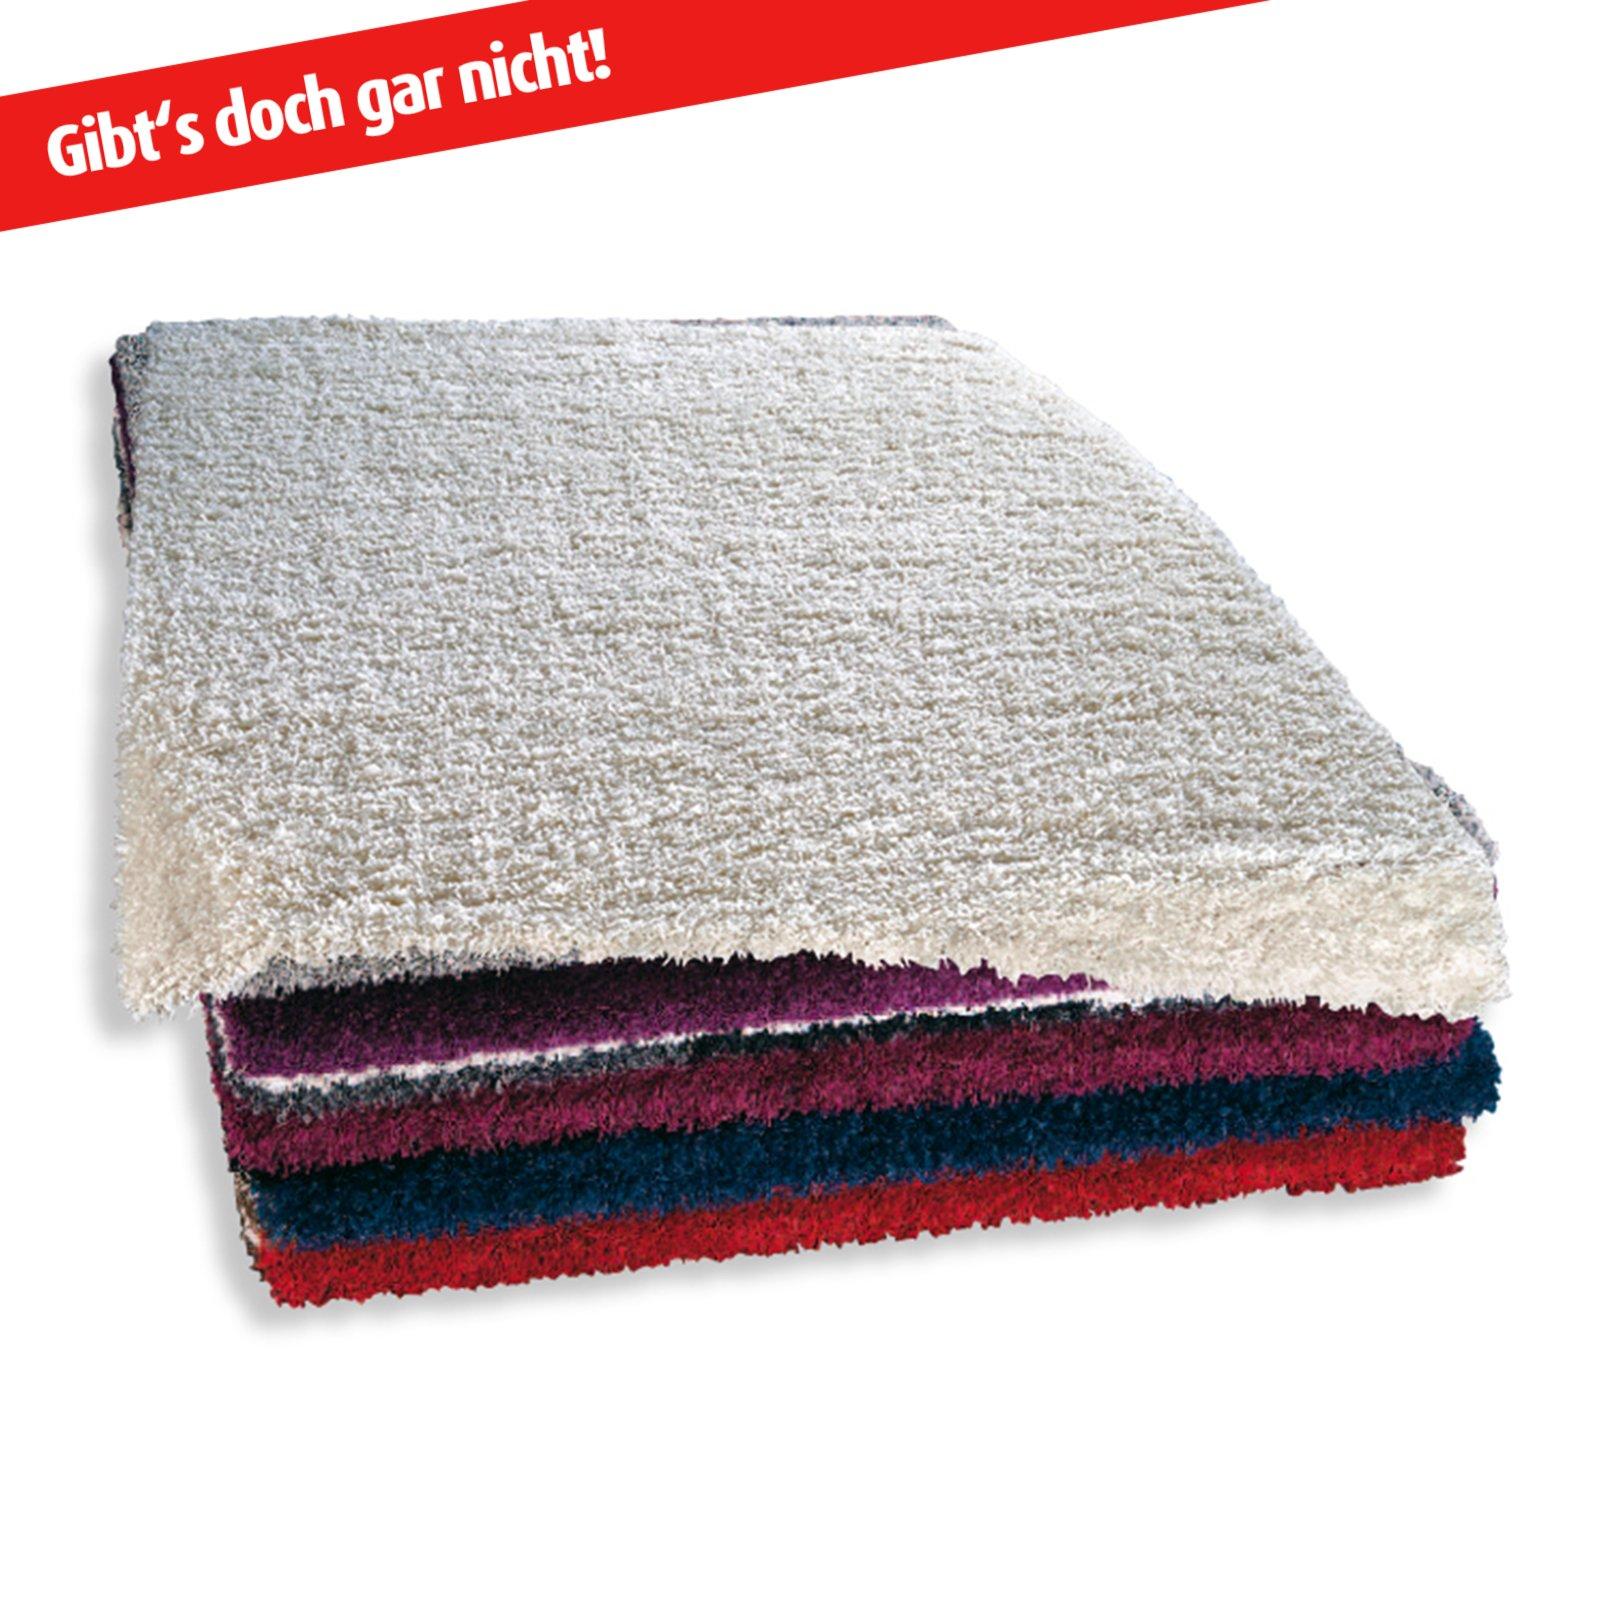 hochflor teppich shaggy plus wei 50x100 cm hochflor shaggyteppiche teppiche l ufer. Black Bedroom Furniture Sets. Home Design Ideas